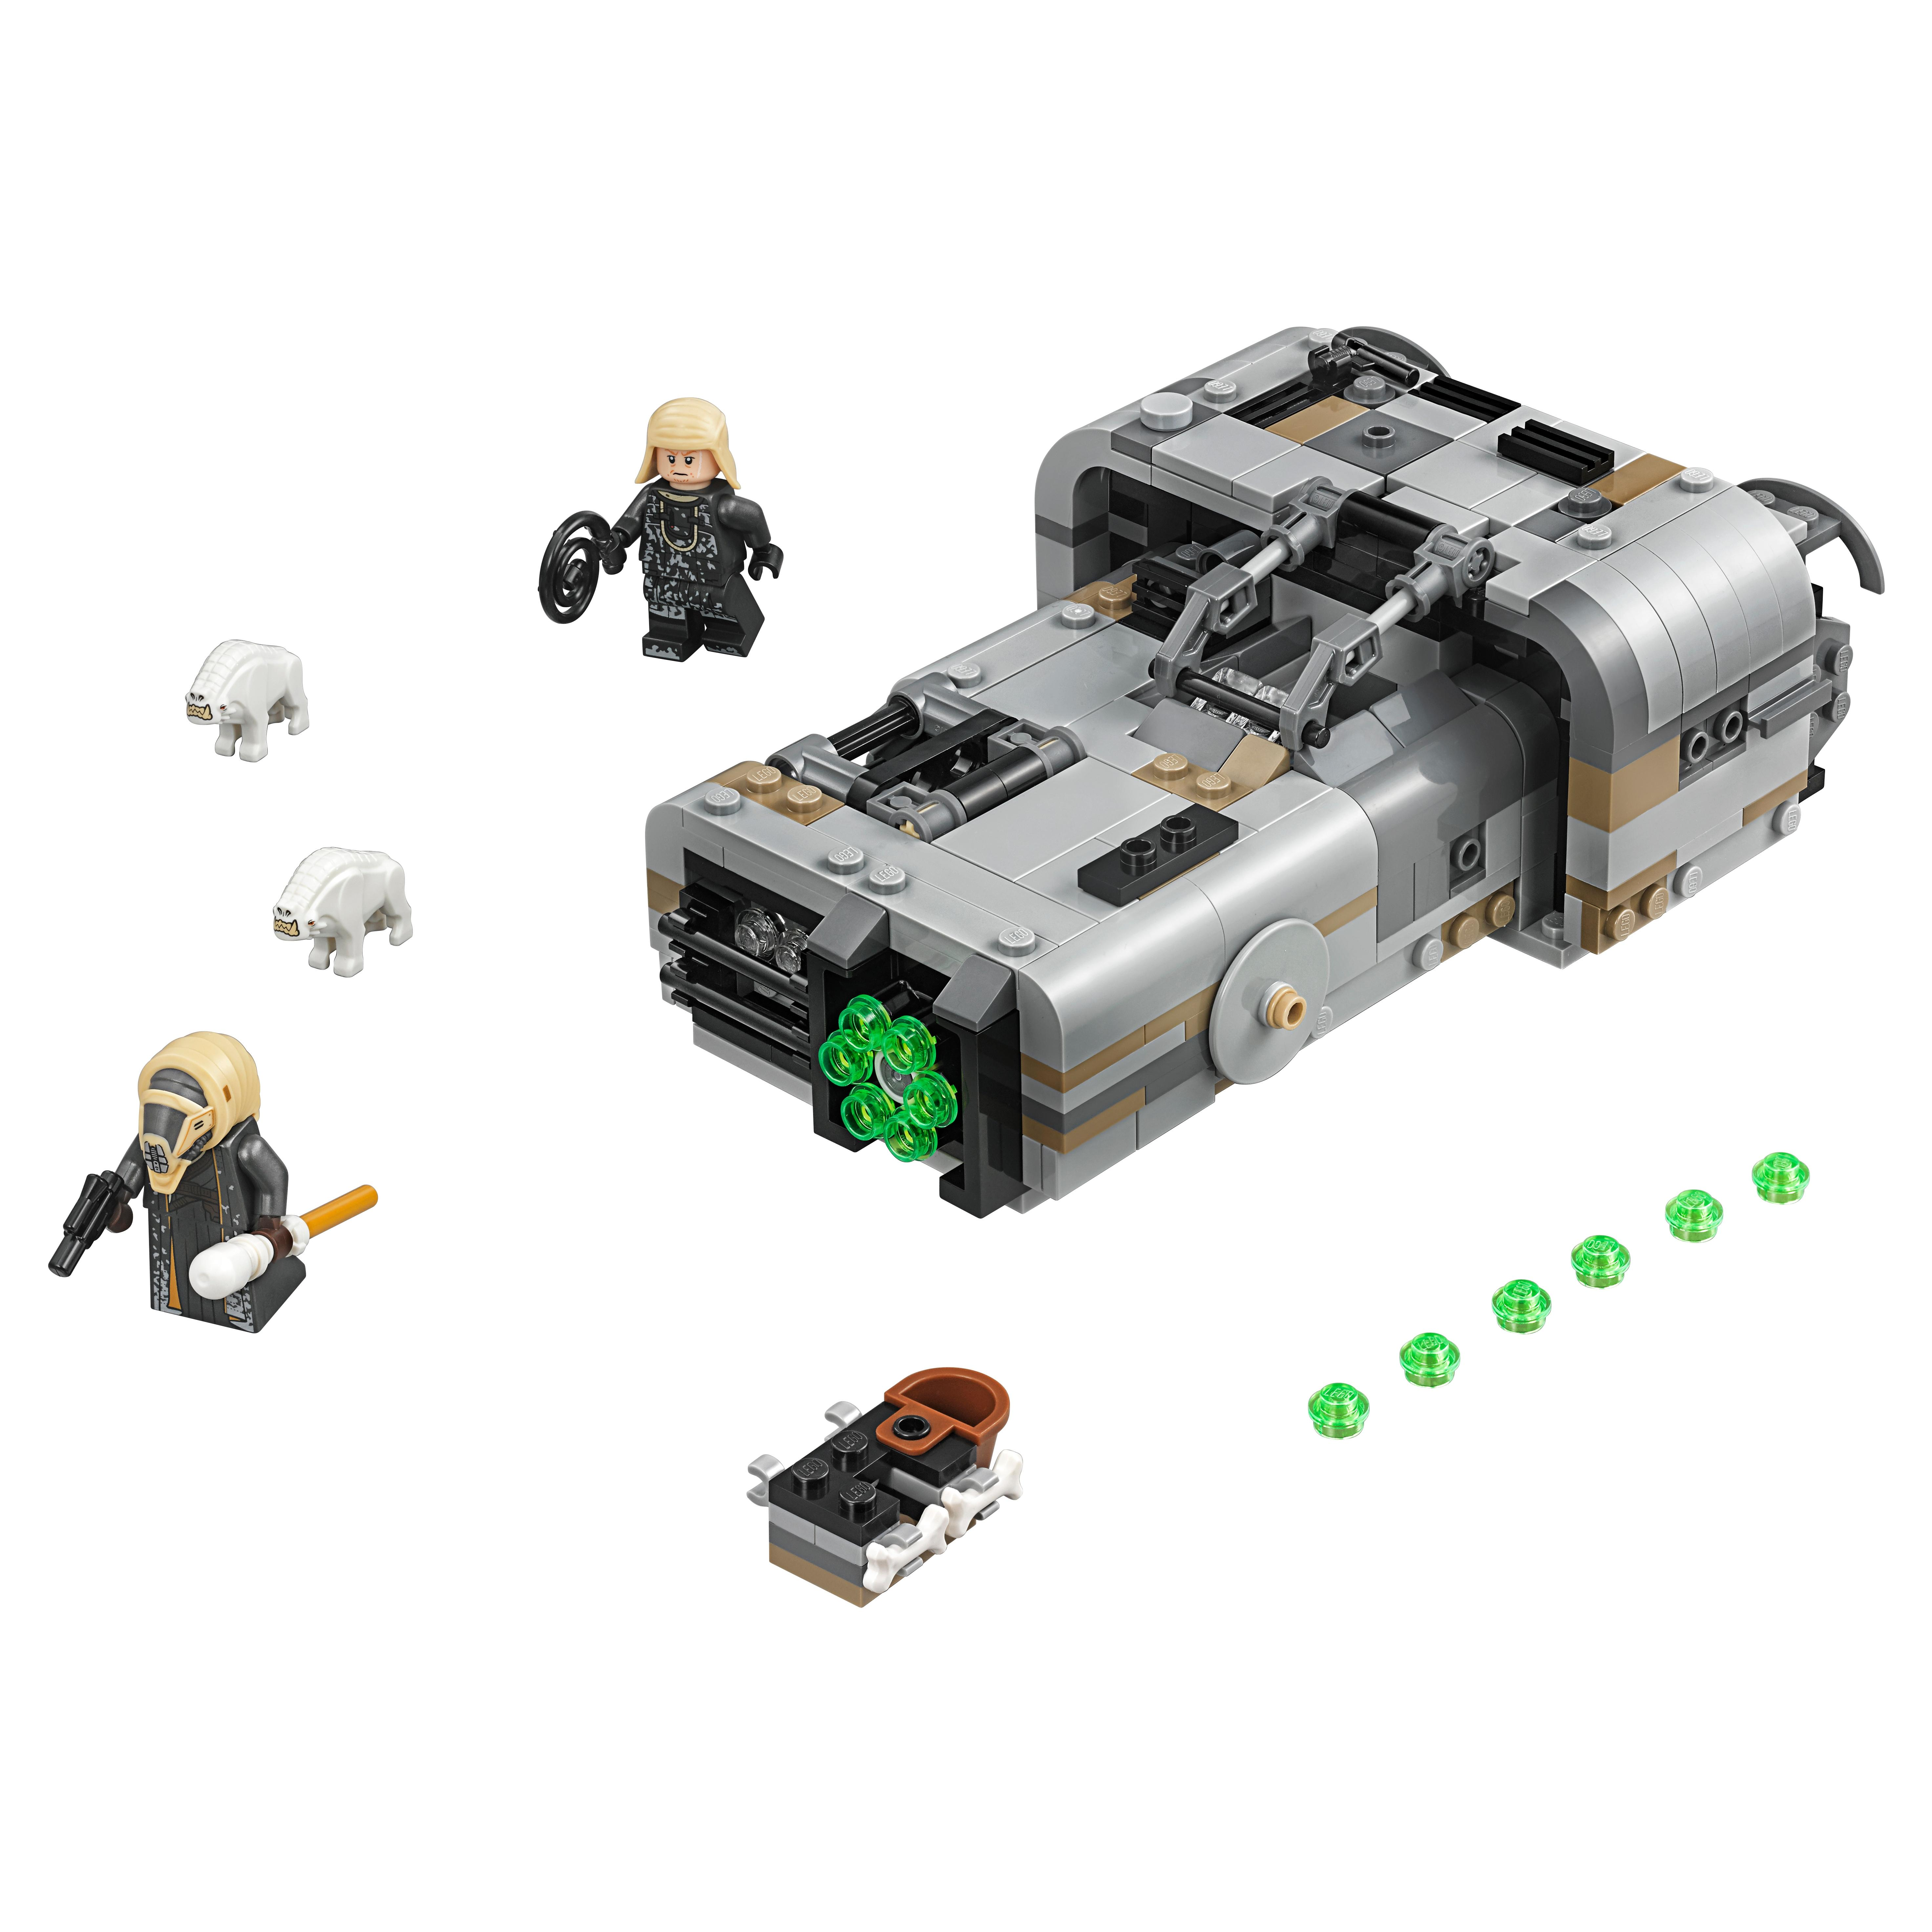 Конструктор LEGO Star Wars Спидер Молоха 75210